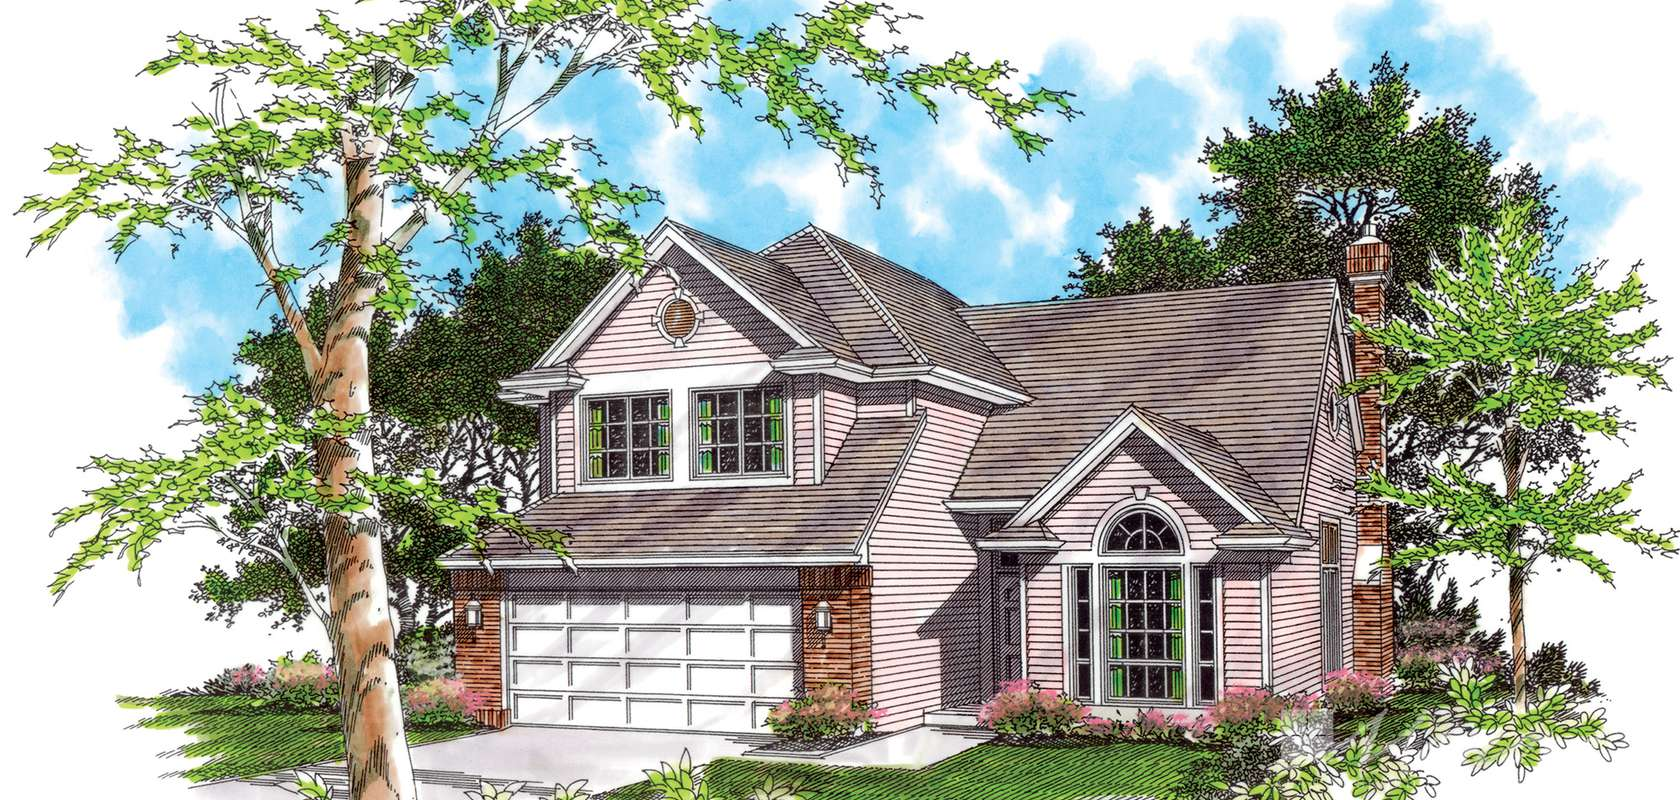 Mascord House Plan 2258: The Lawson